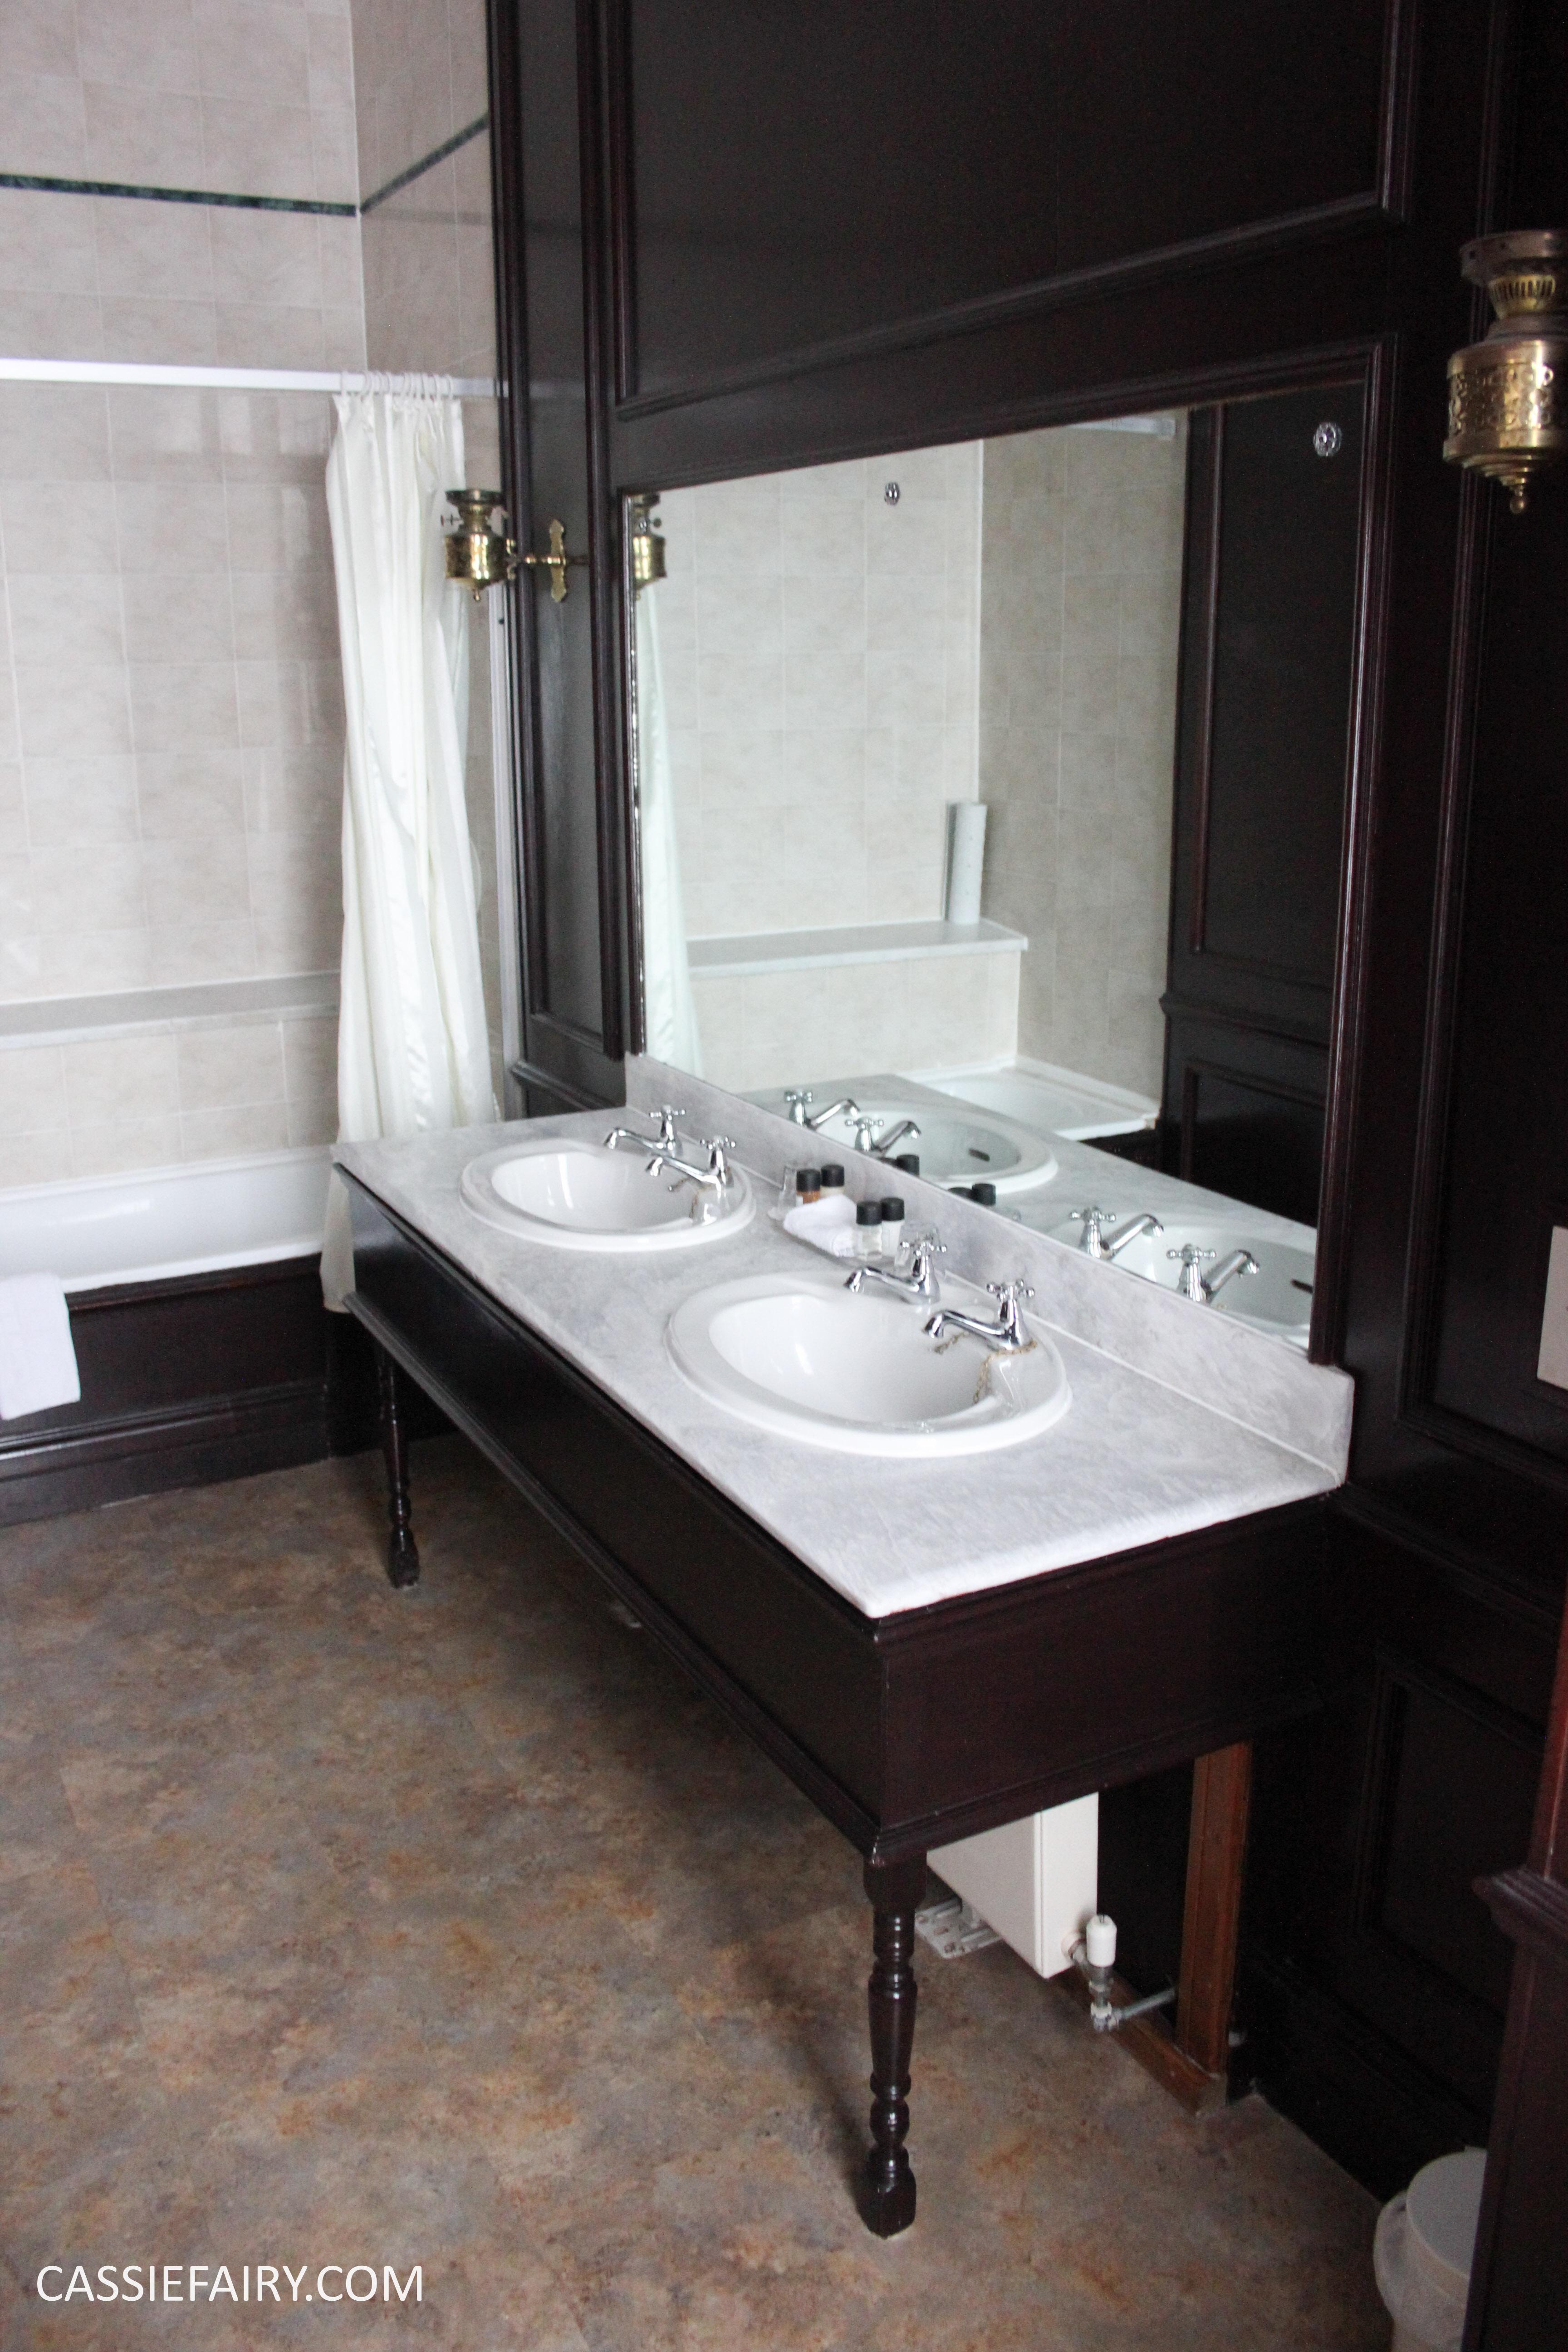 Interior design inspiration - Luxurious 4* hotel bathrooms